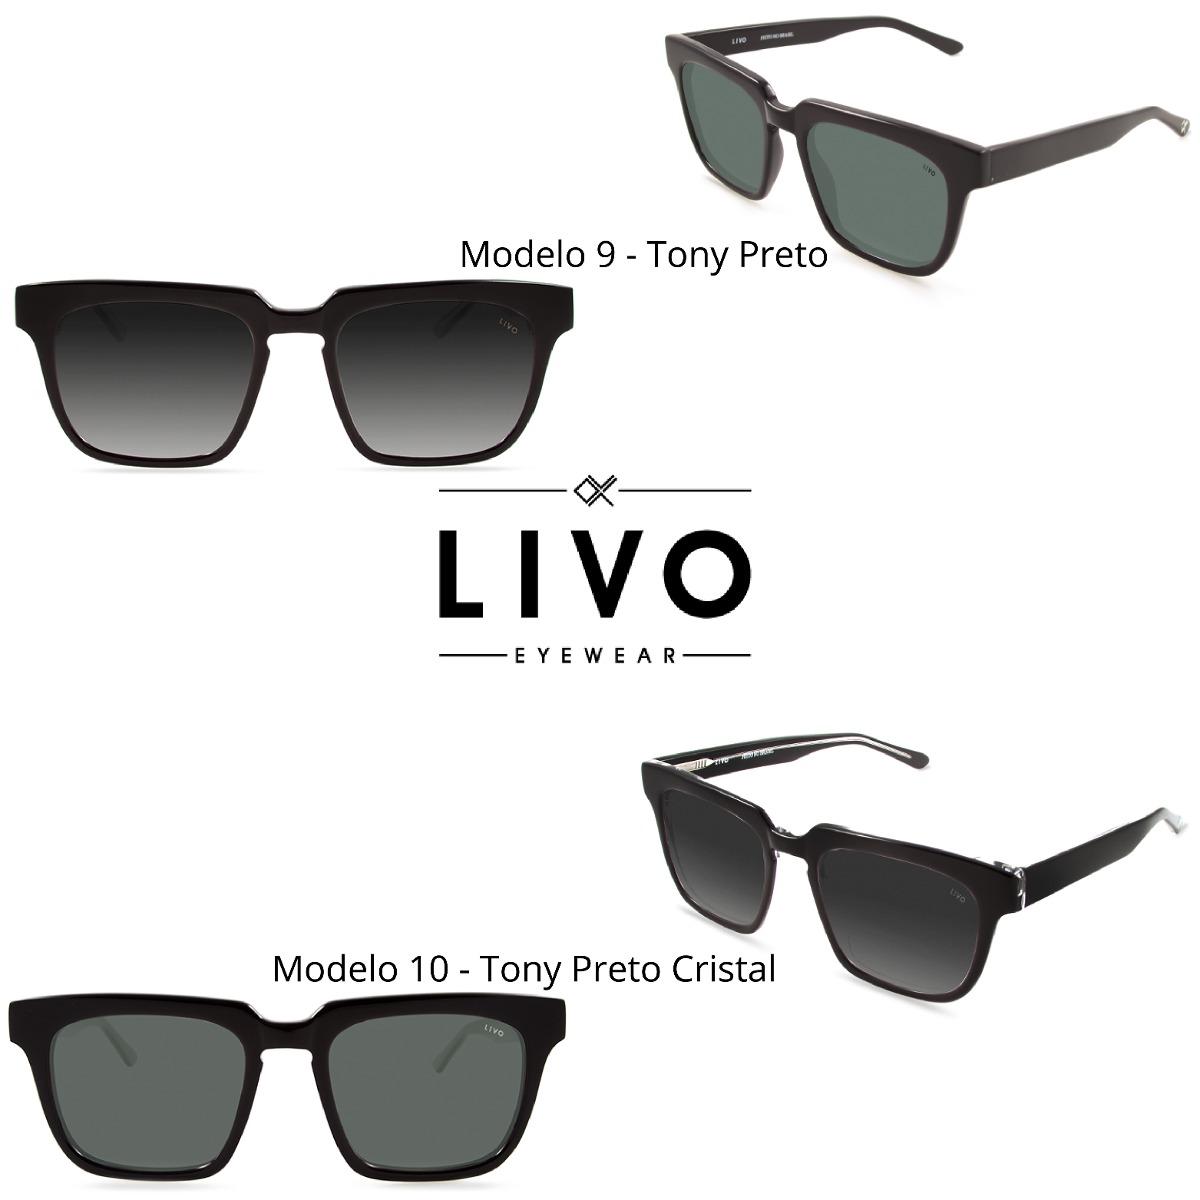 8369aba442932 Óculos De Sol Escuro Masculino - Livo - R  399,00 em Mercado Livre